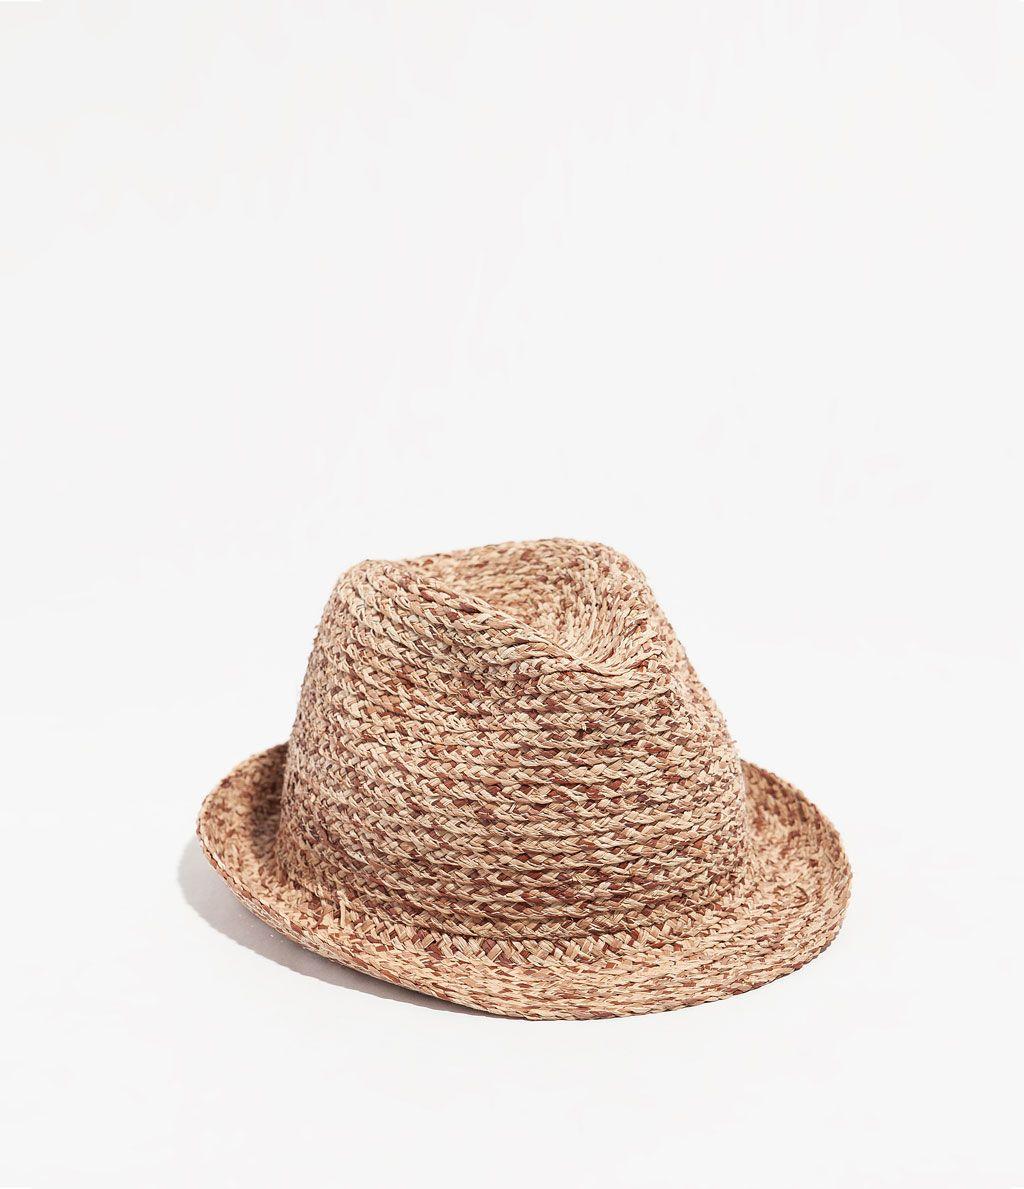 sombrero  bicolor  paja  · ZARA · 15 0314e485439